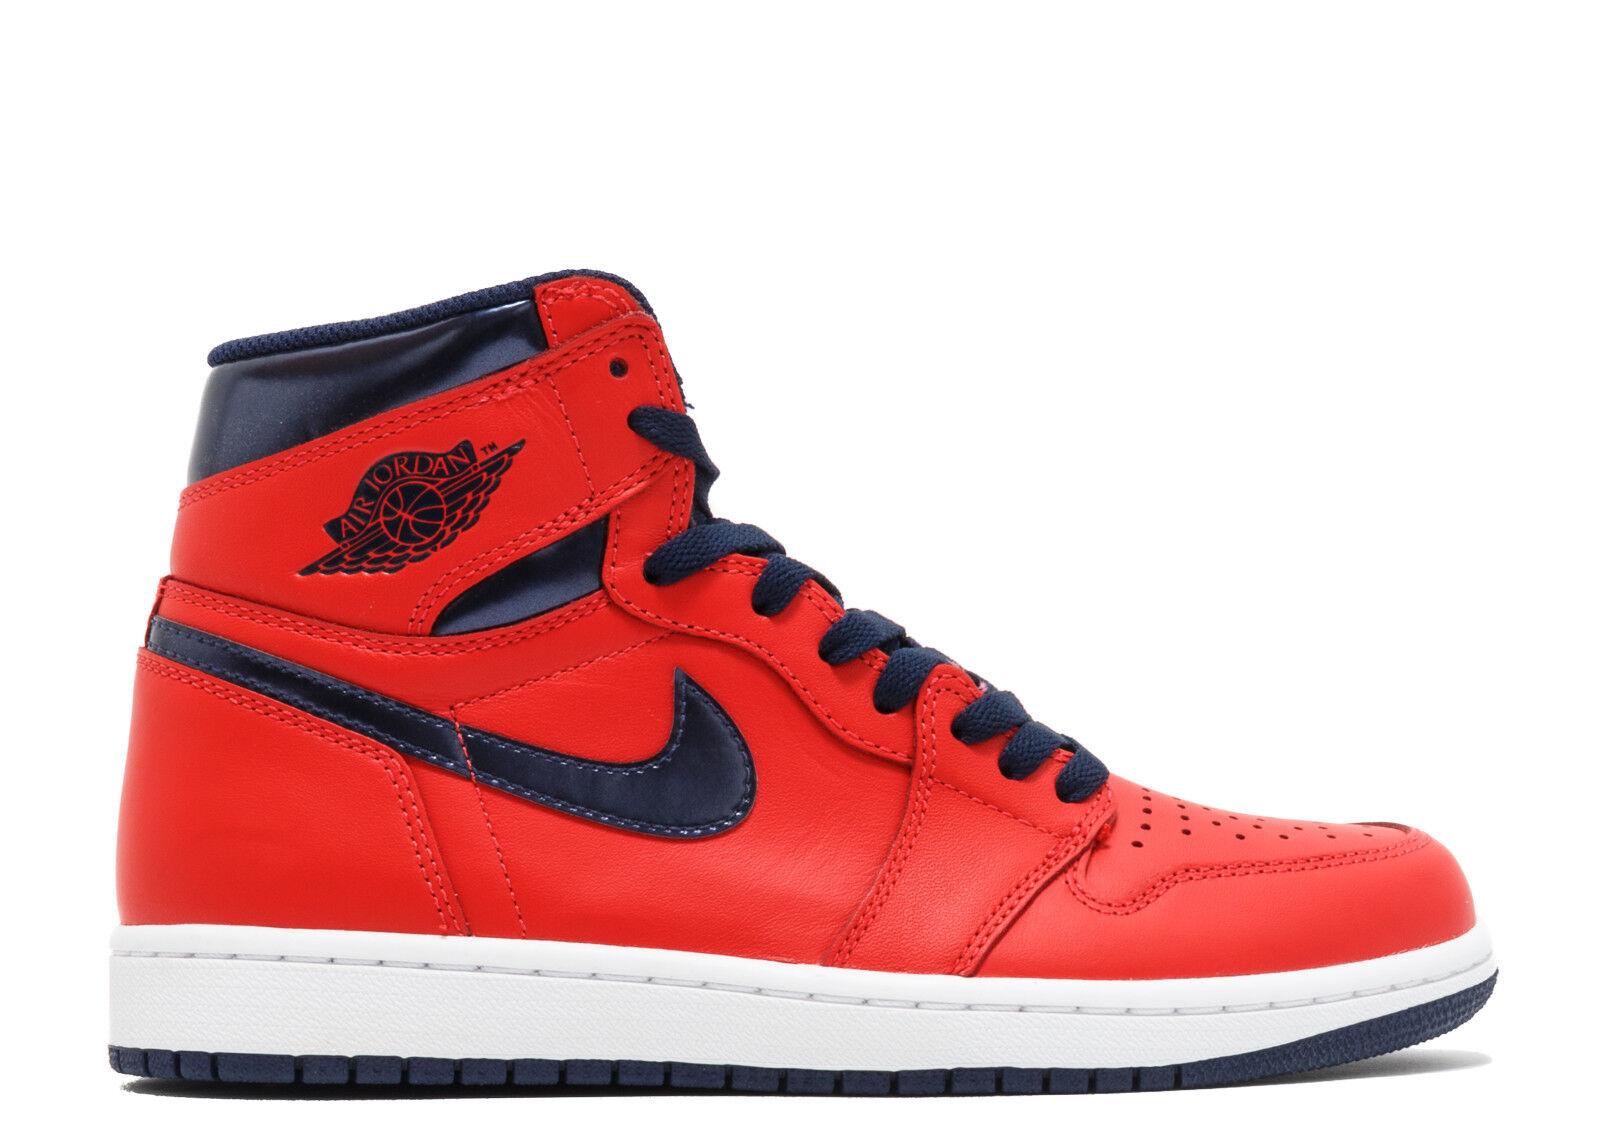 Uomo Nike Air Jordan Retro 1 High OG